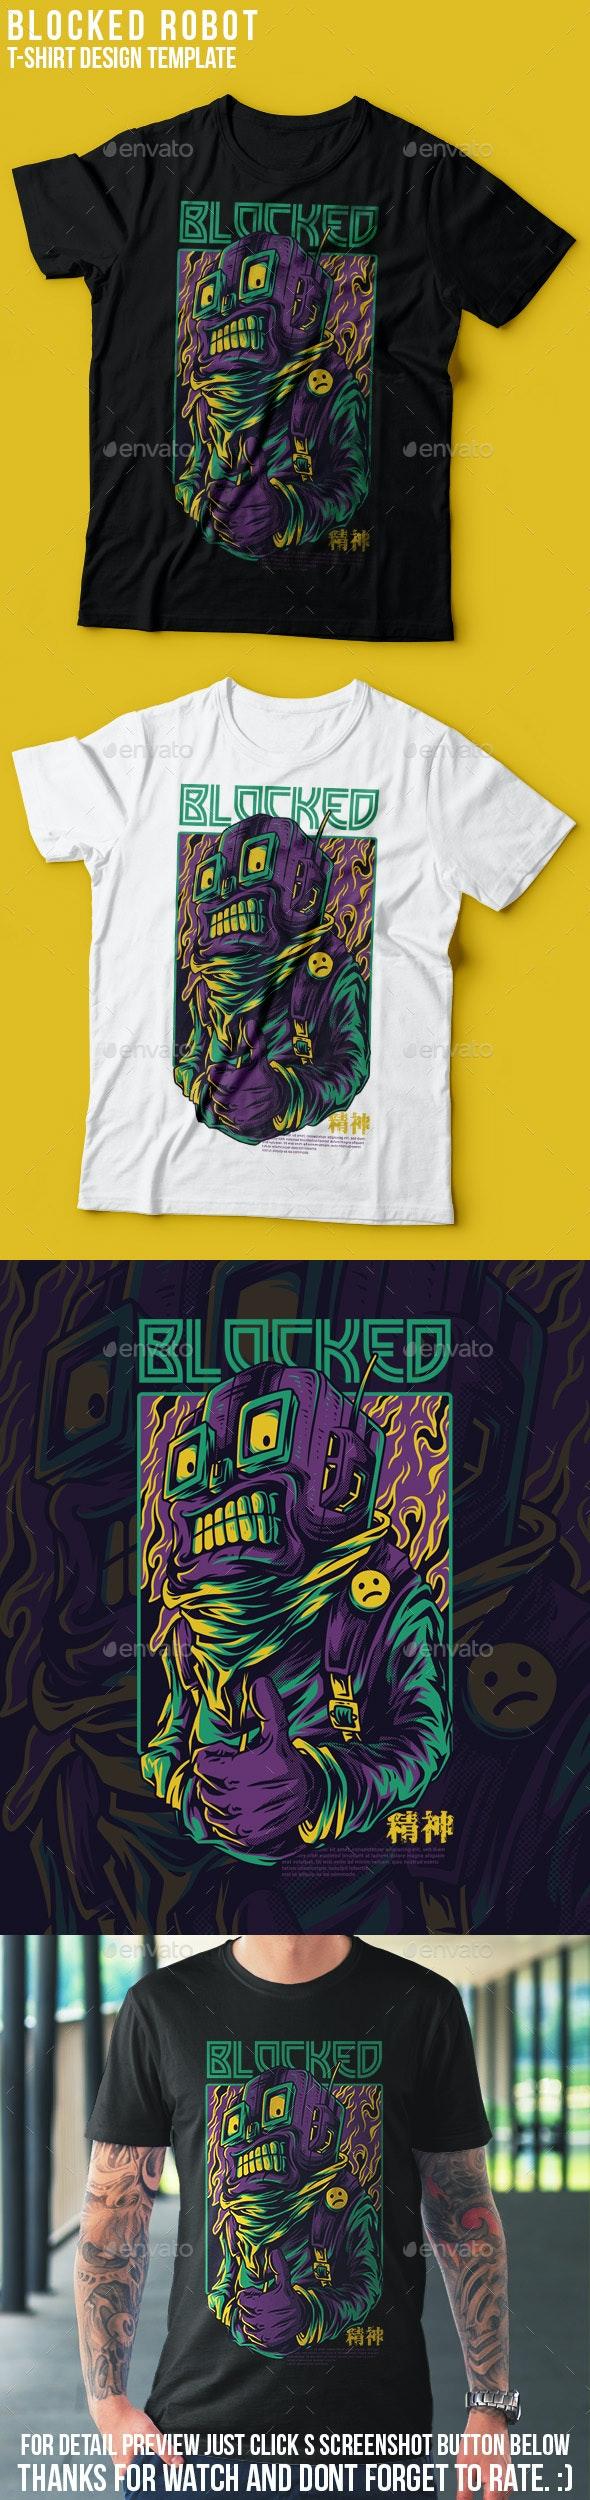 Blocked Robot T-Shirt Design - Grunge Designs